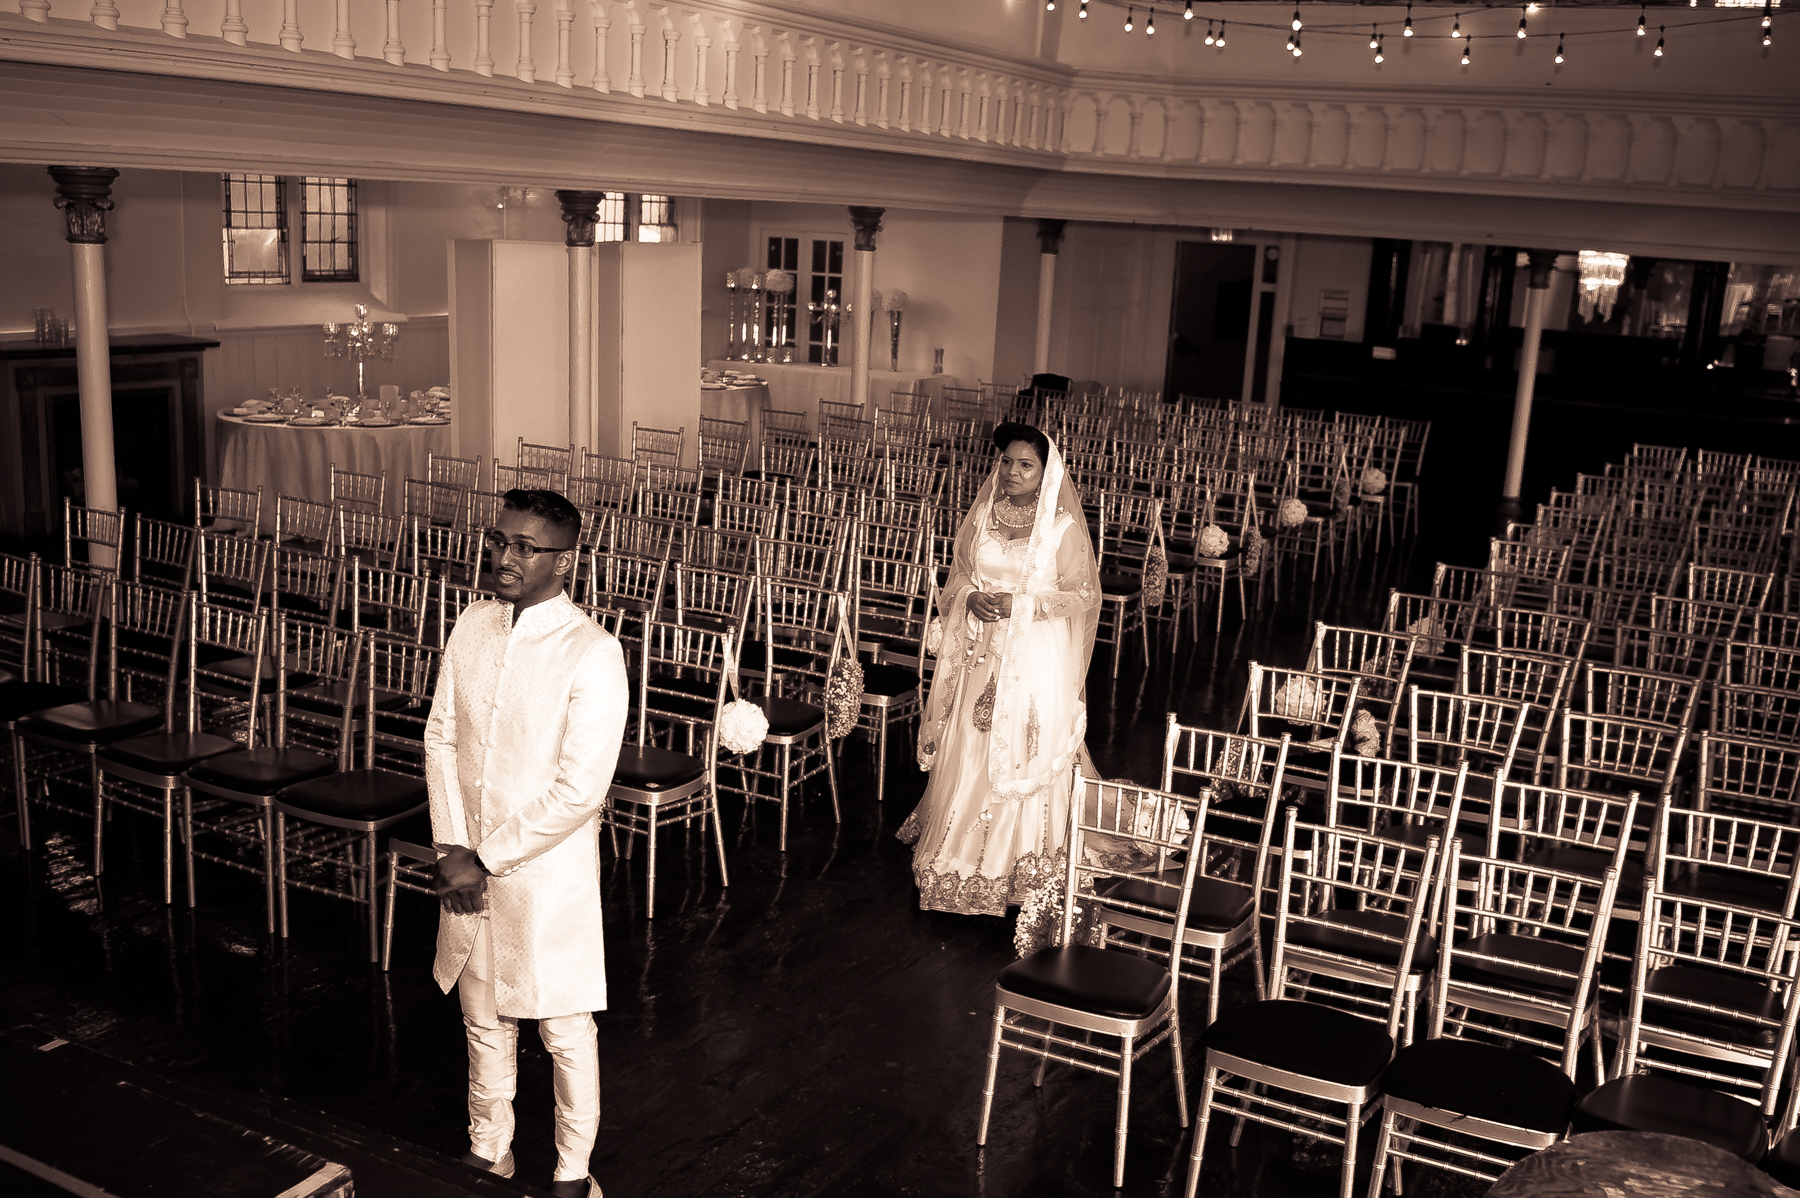 First look bride walking down aisle at '1871' Berkeley Church Event Venue